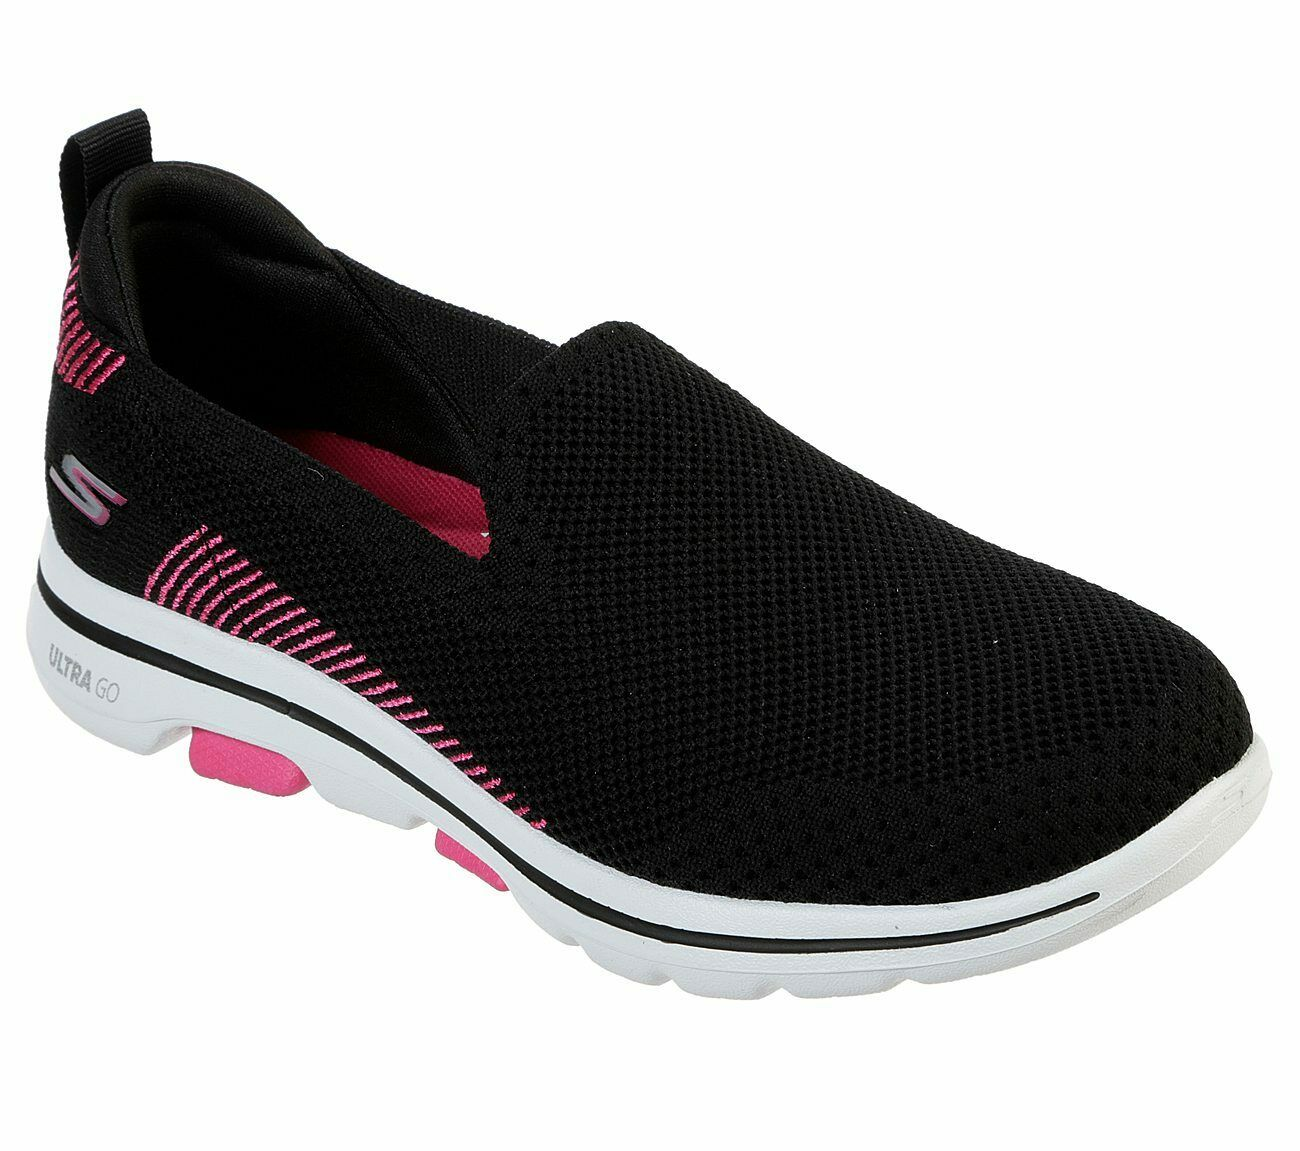 Pink Women's Black 5 Slip Skechers Sporty On 15900 Go Shoes Comfort Walk Casual hdxsQrCt